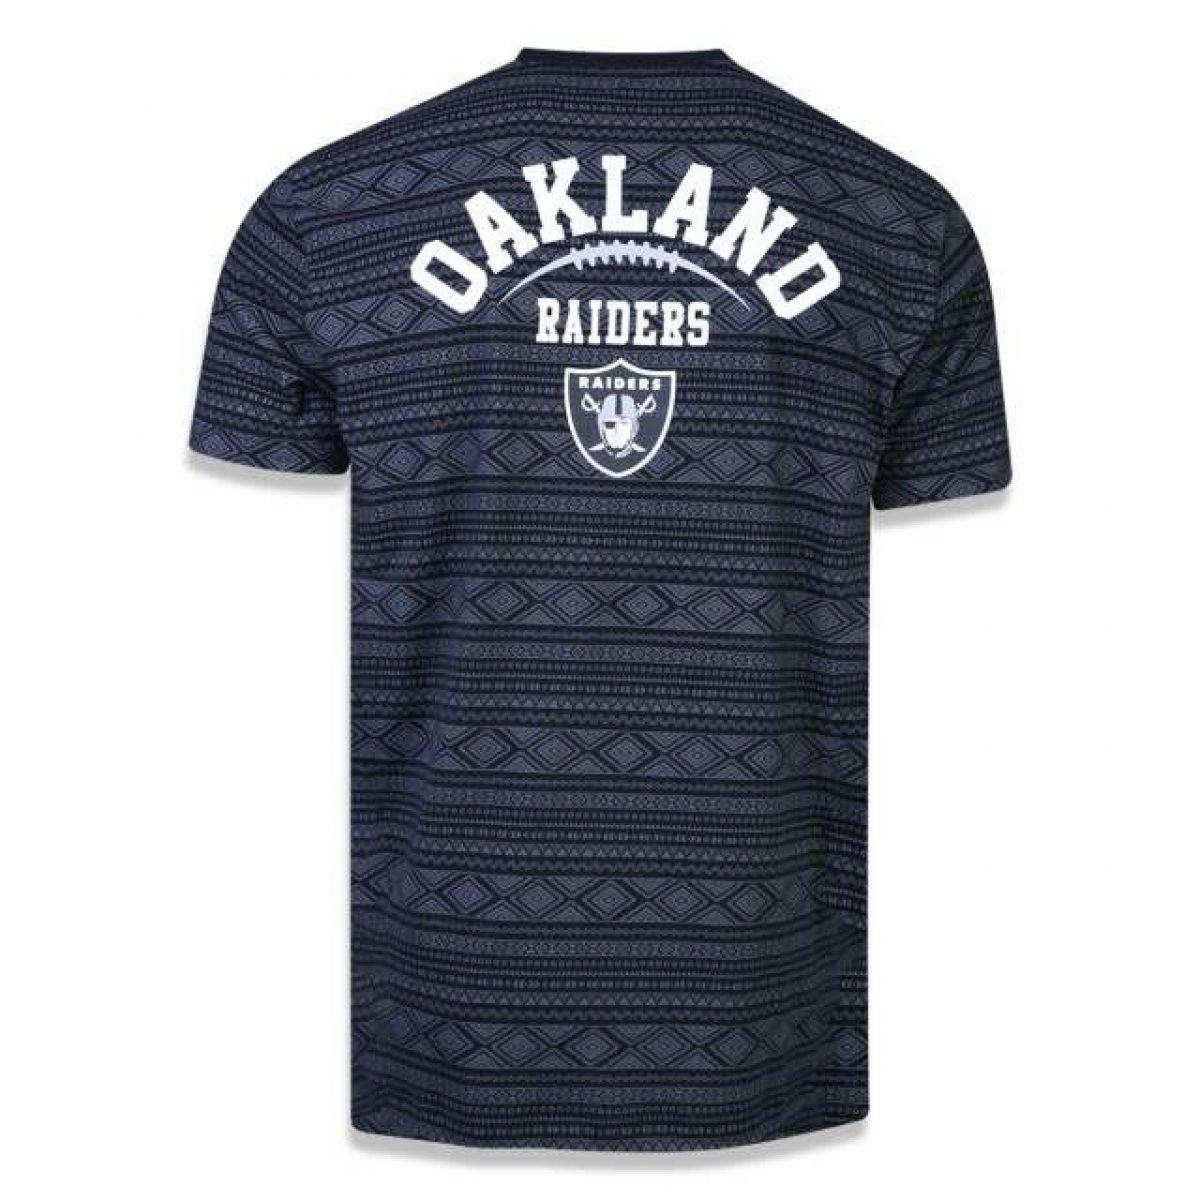 Camiseta New Era Native Americans Native Oakrai - PRETO